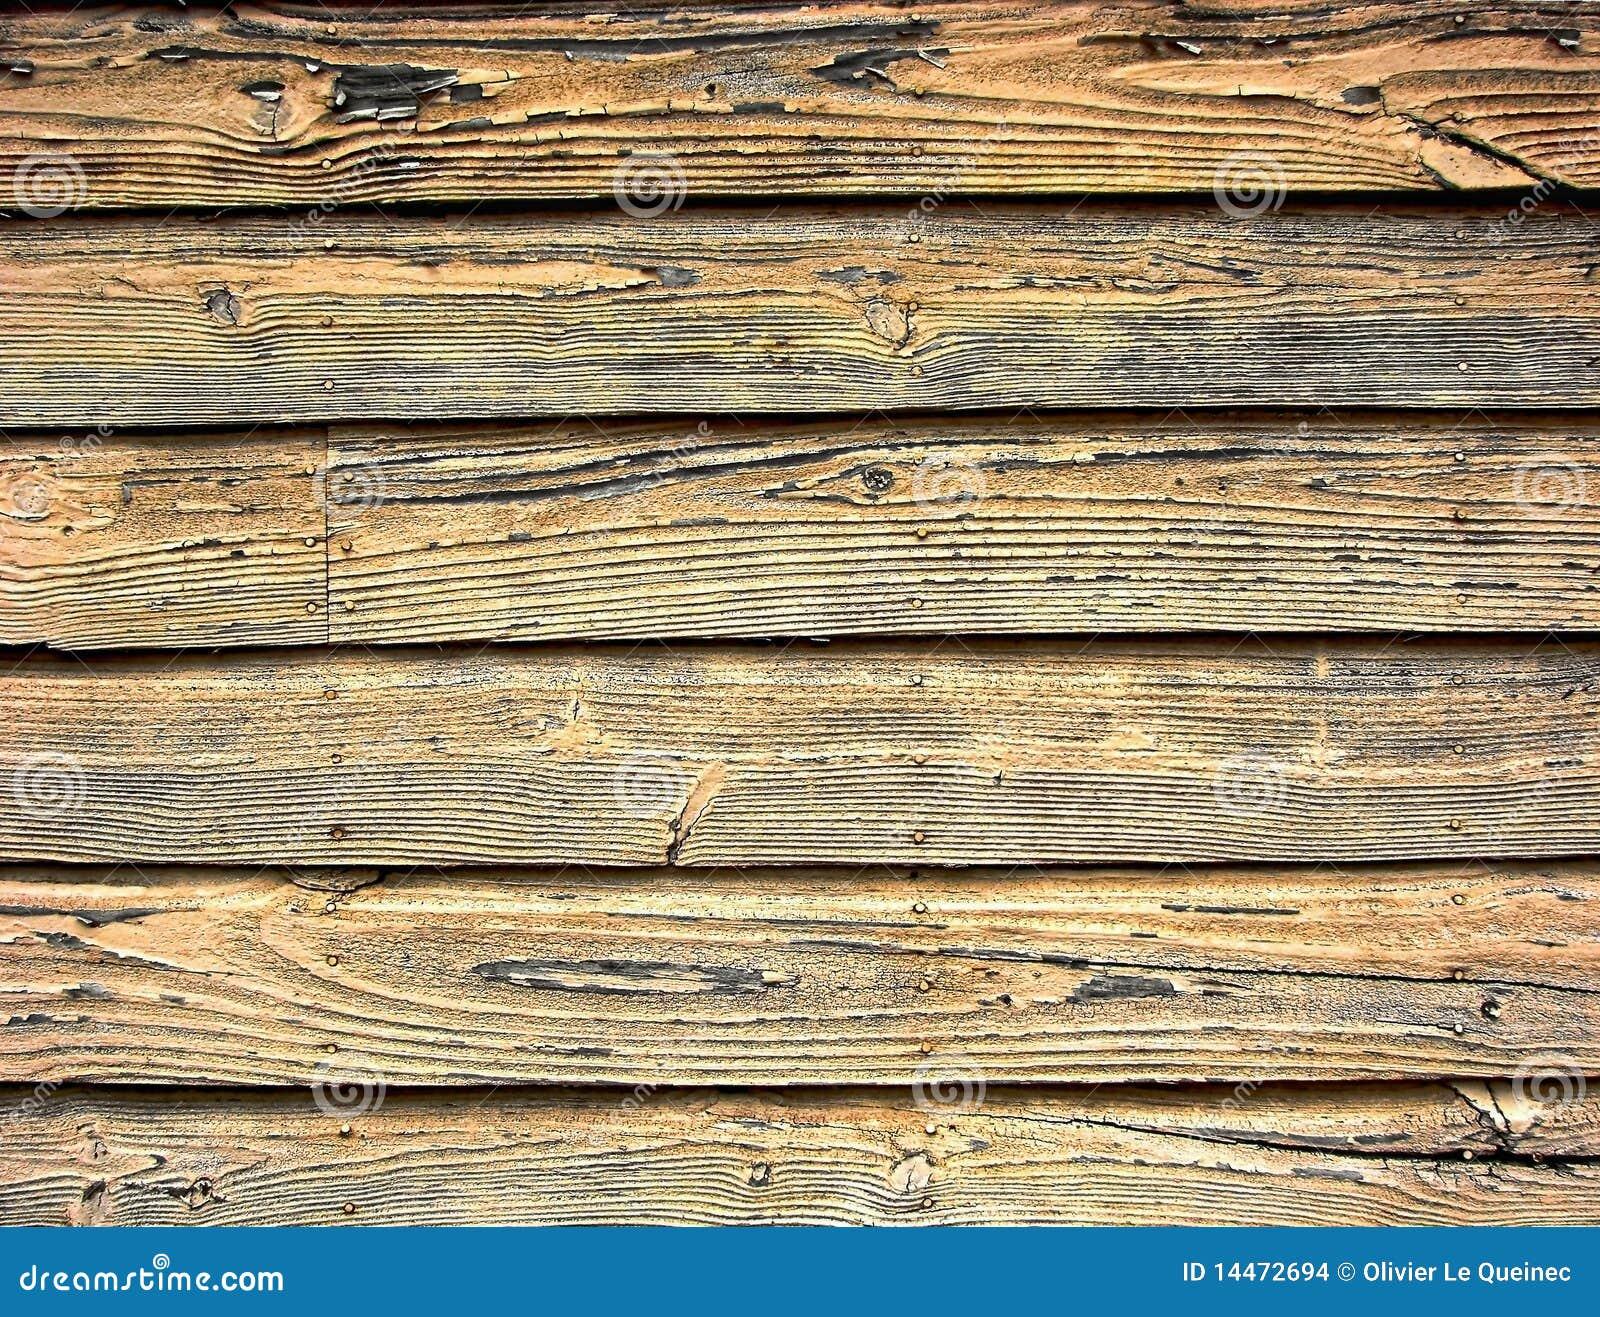 vieux bardeau en bois de grange images stock image 14472694. Black Bedroom Furniture Sets. Home Design Ideas